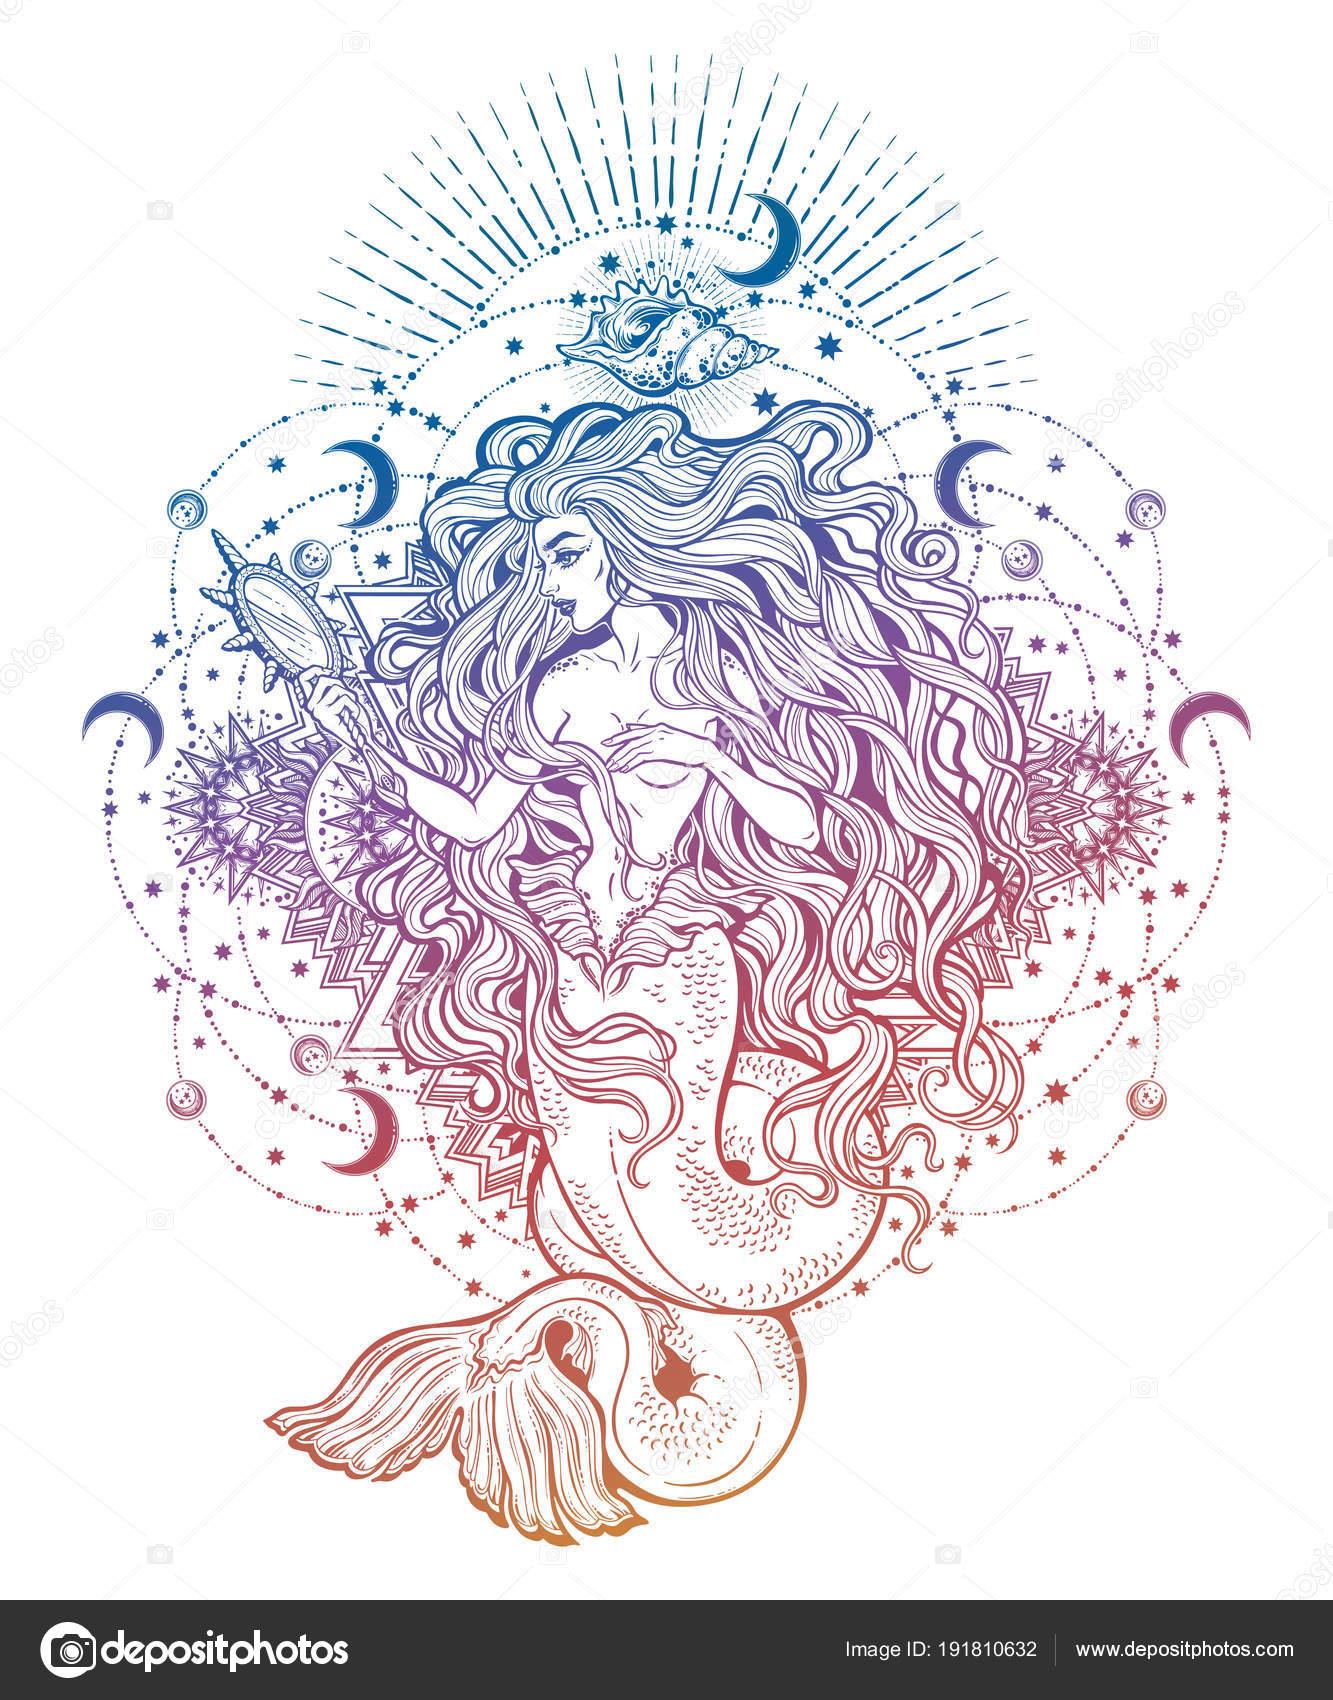 Mermaid Girl With Magic Mirror In Ornate Mandala Stock Vector C Katja87 191810632